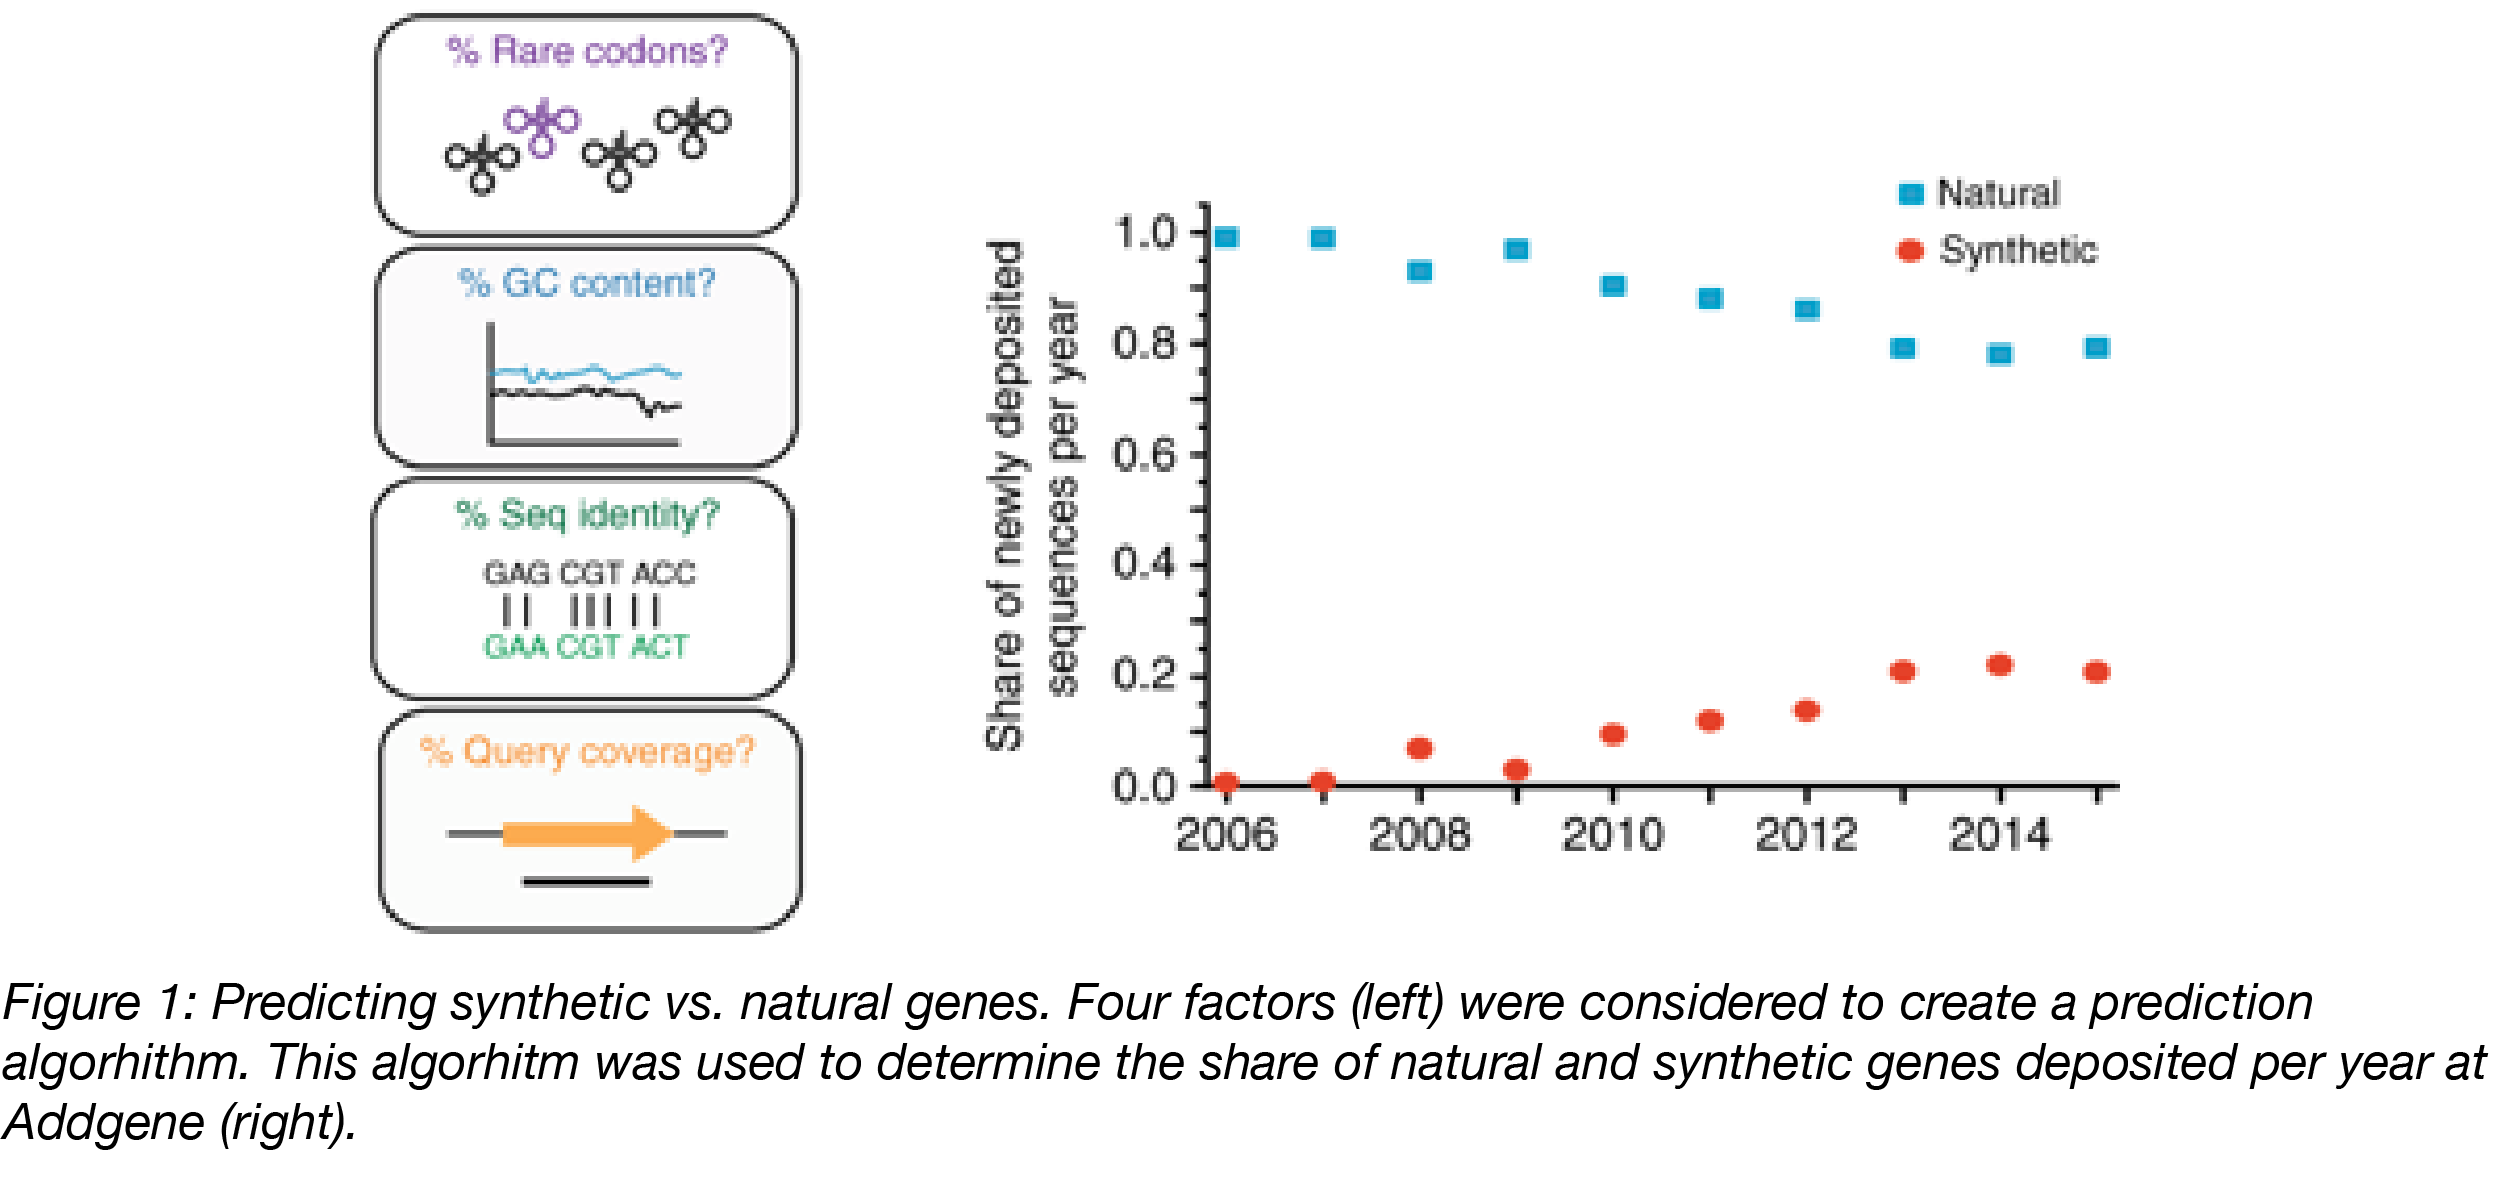 Natural vs synthetic gene